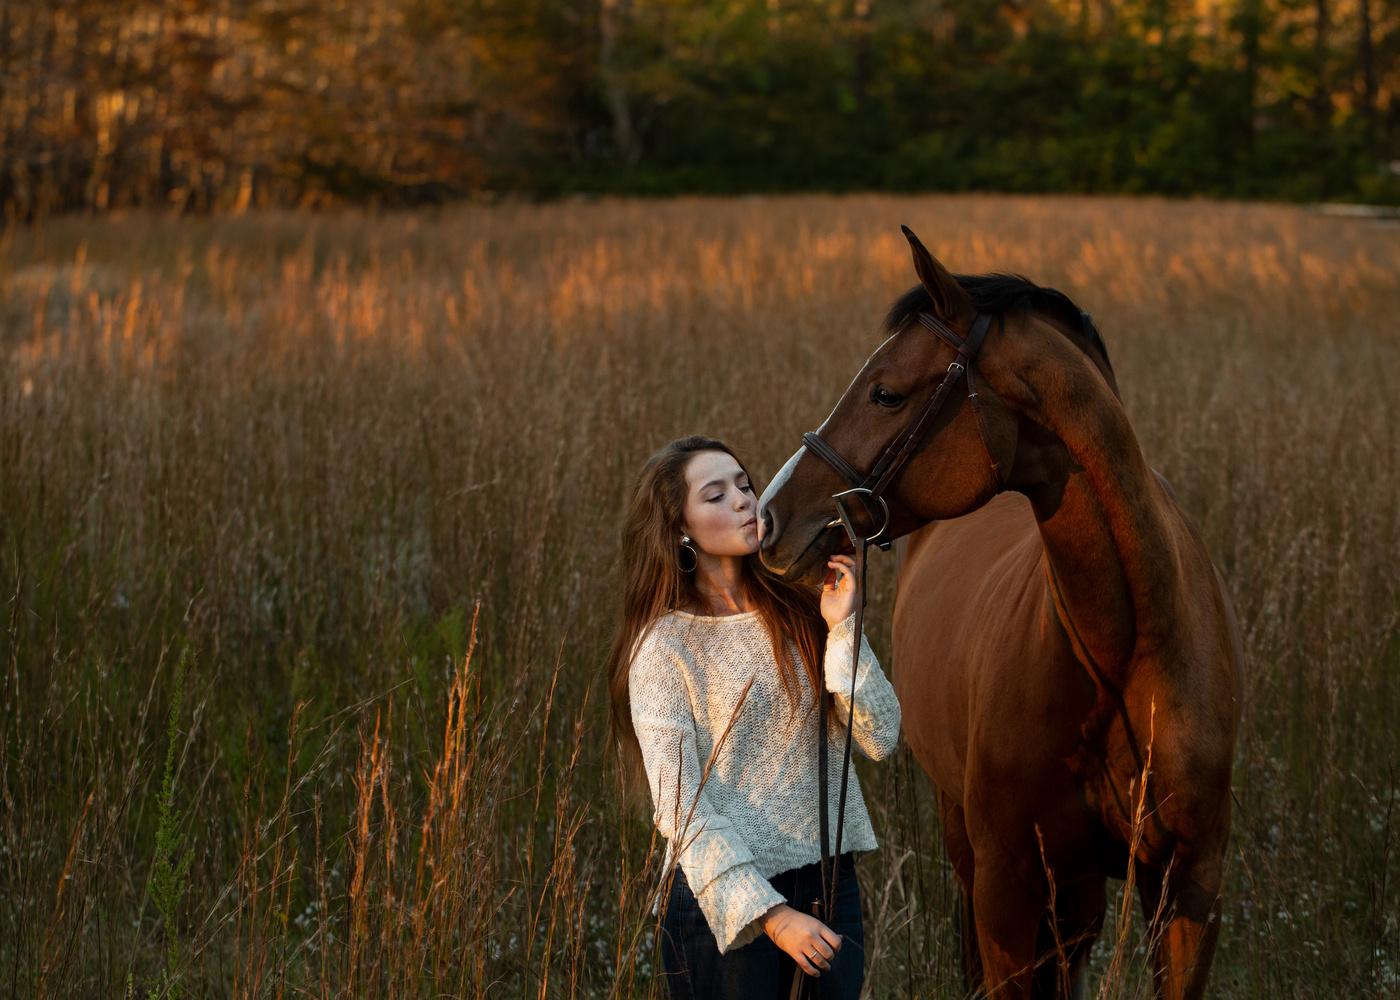 Lily and Kara by melinda brown